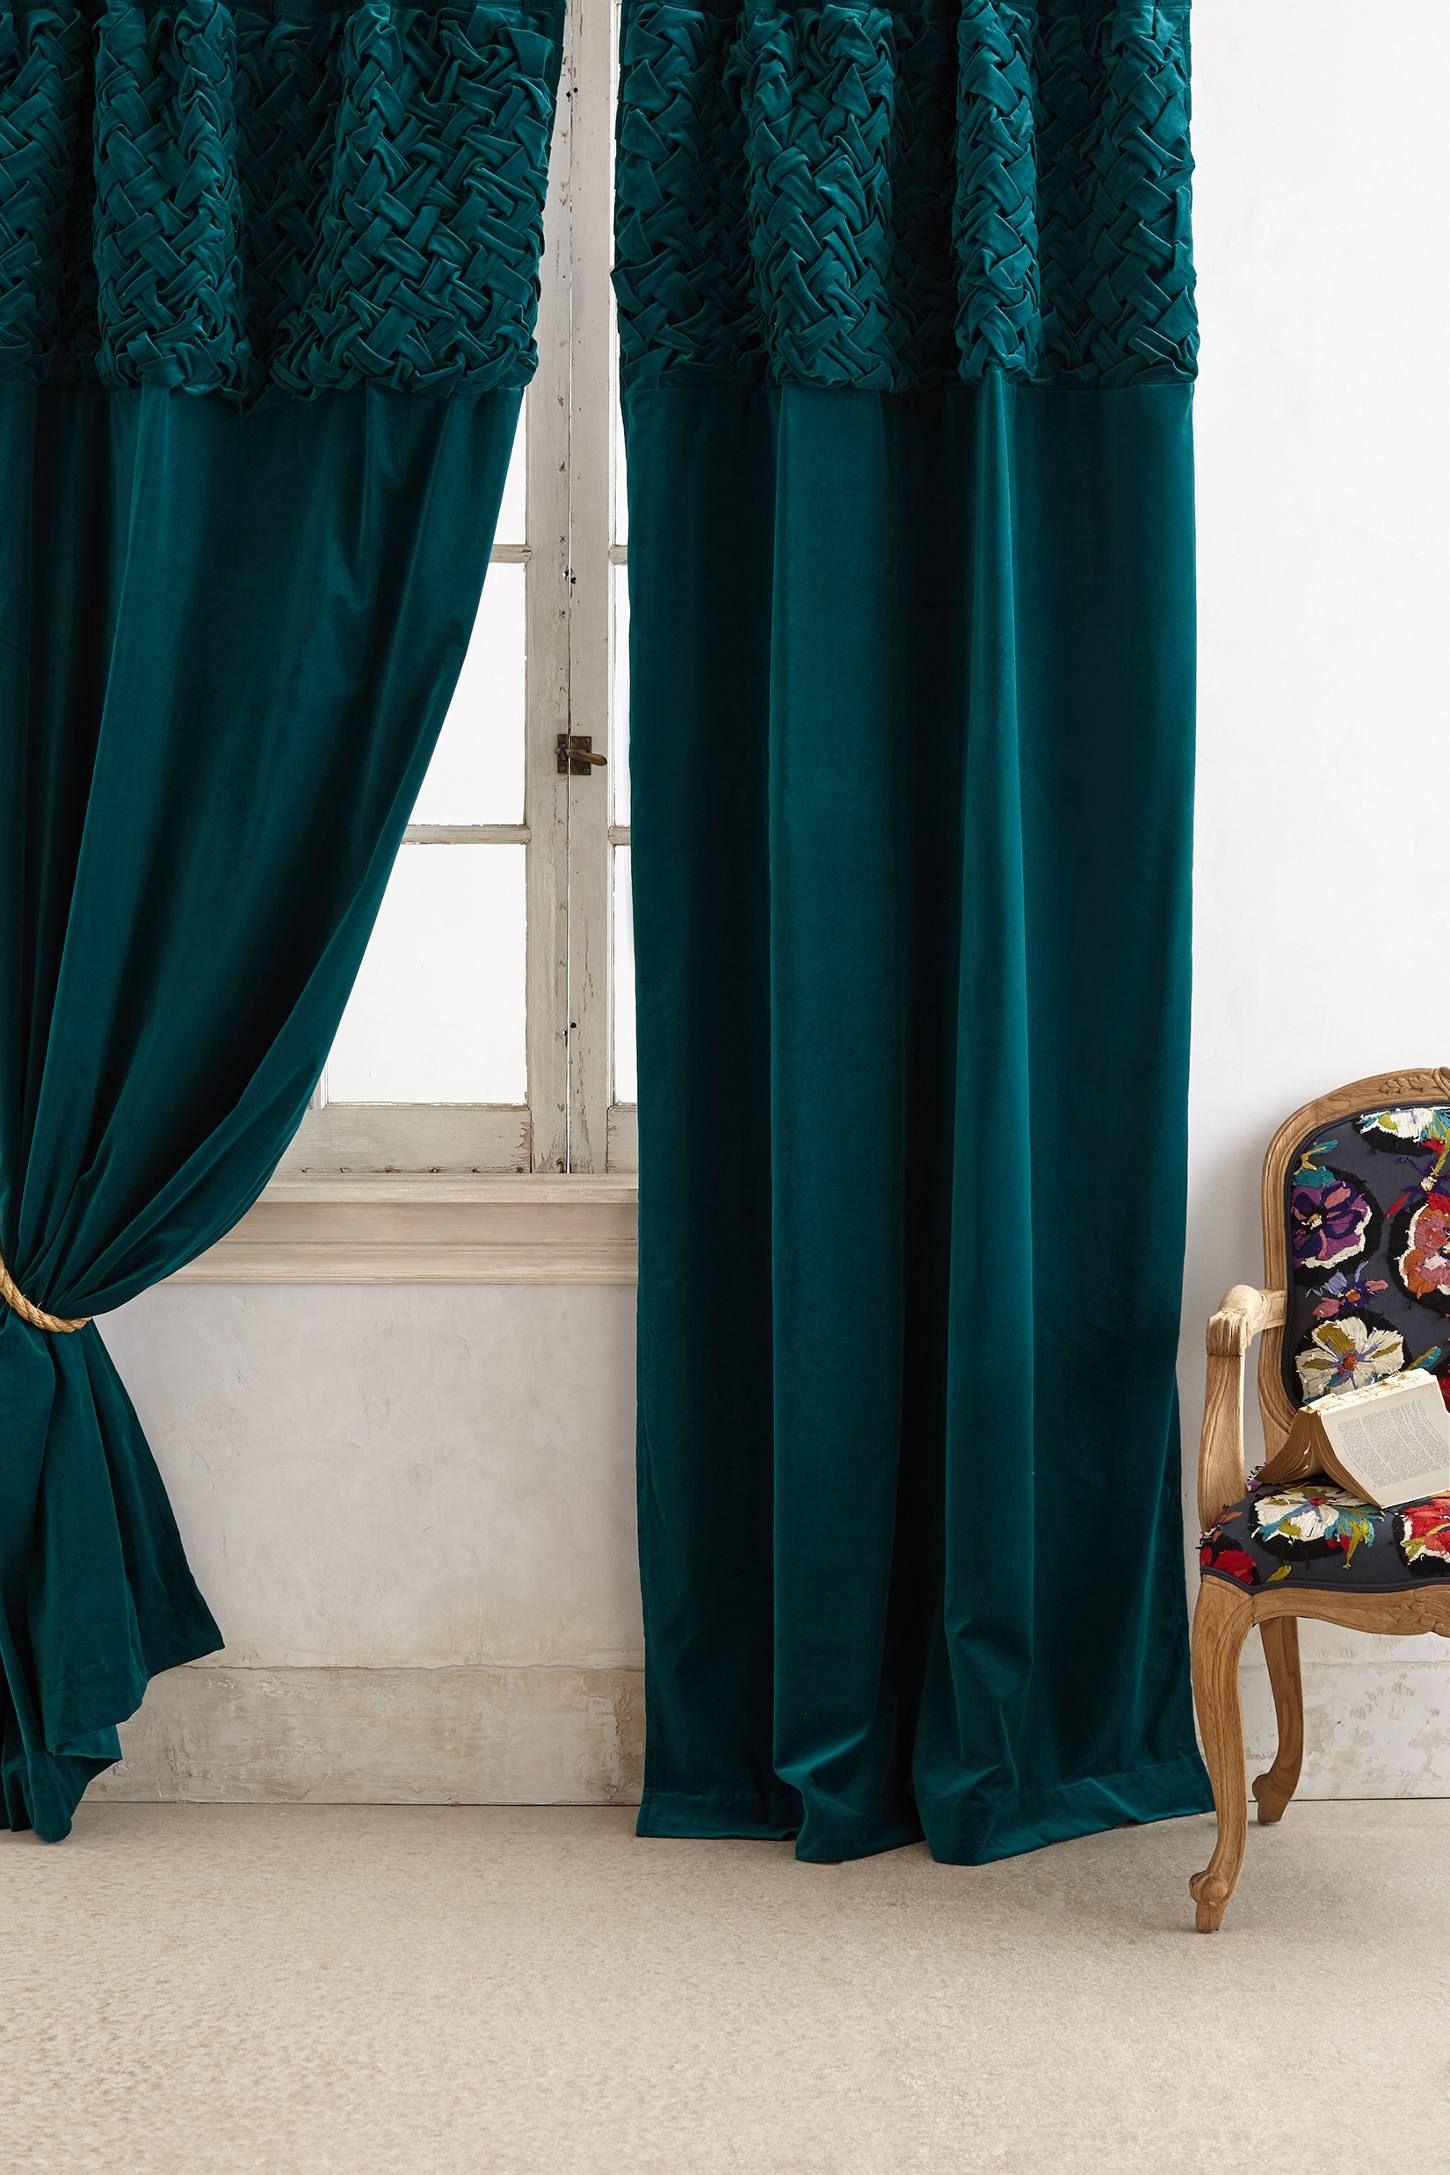 photography curtains kinnasand blogspot and textiles danskina fr dark pin interiors teal weekdaycarnival industrial